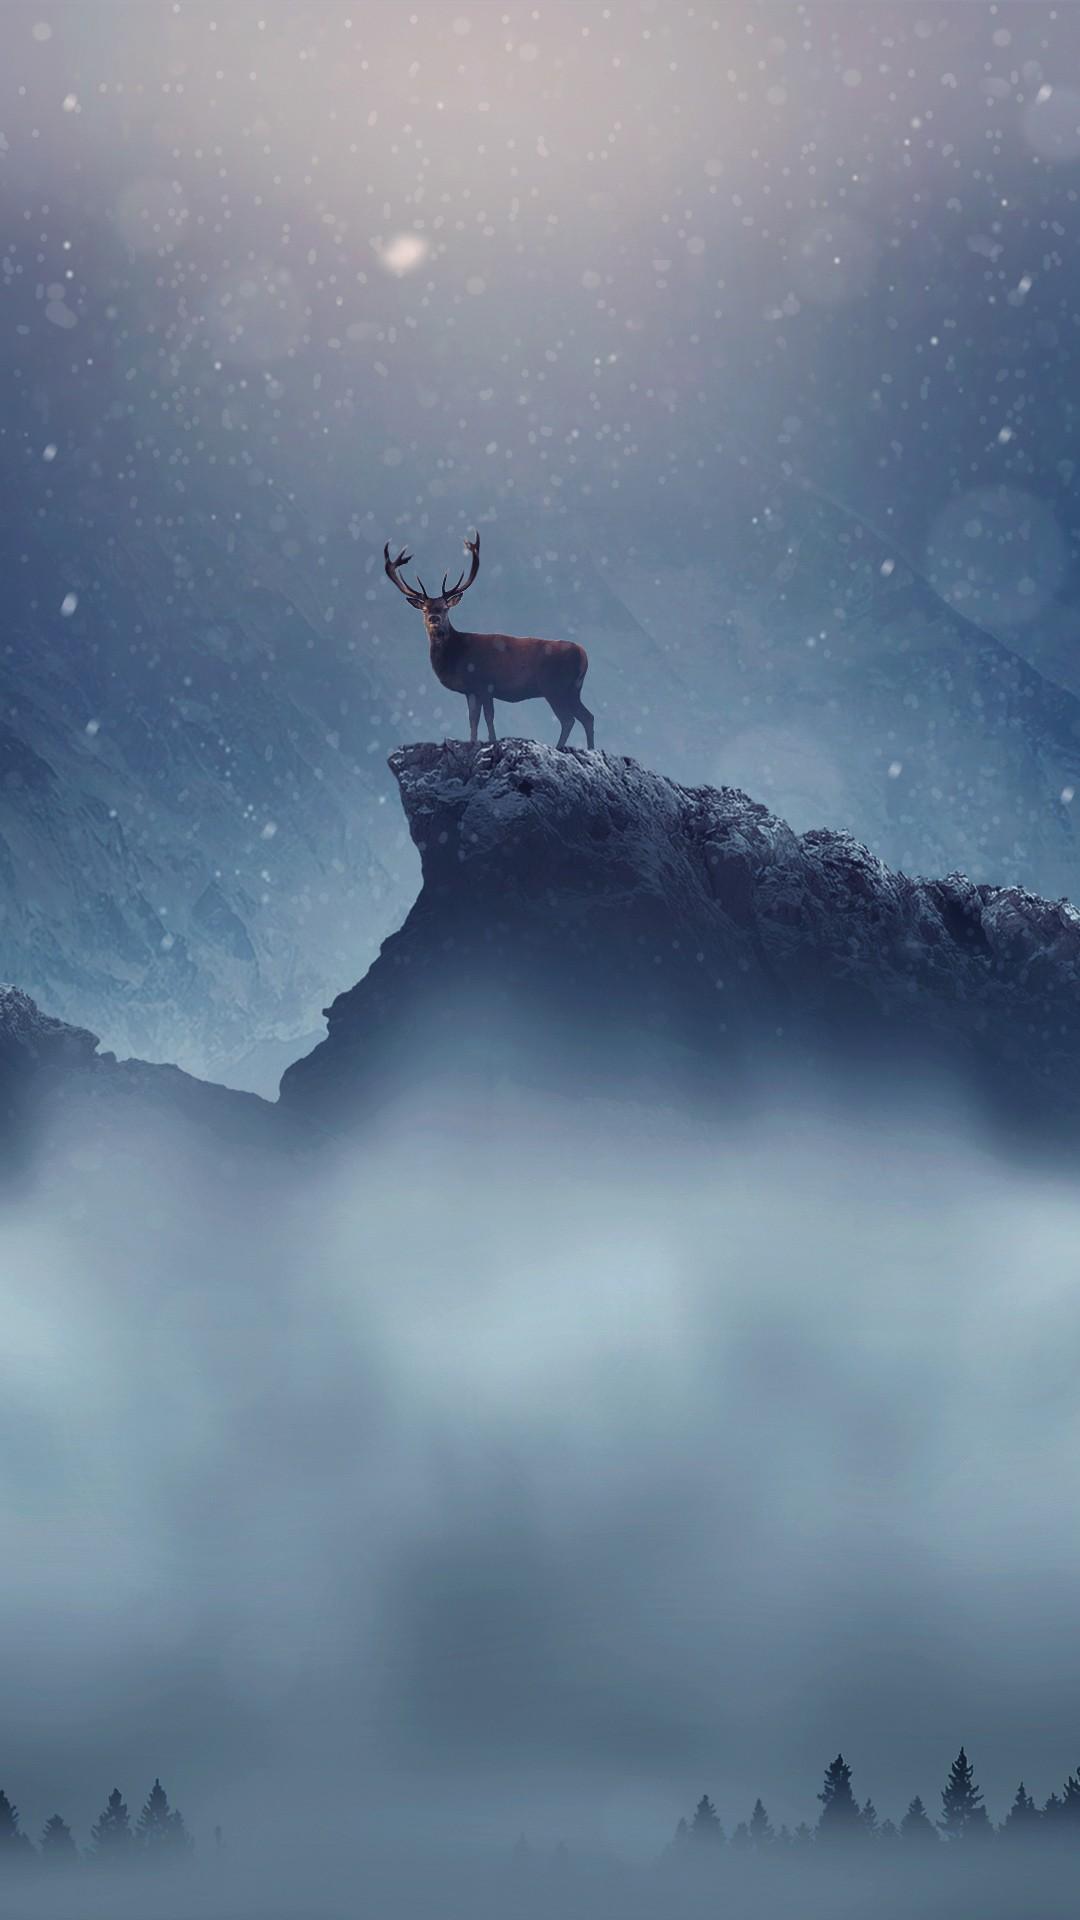 Iphone Hd Retina Wallpapers Christmas Deer Snowfall Wallpapers Hd Wallpapers Id 22613